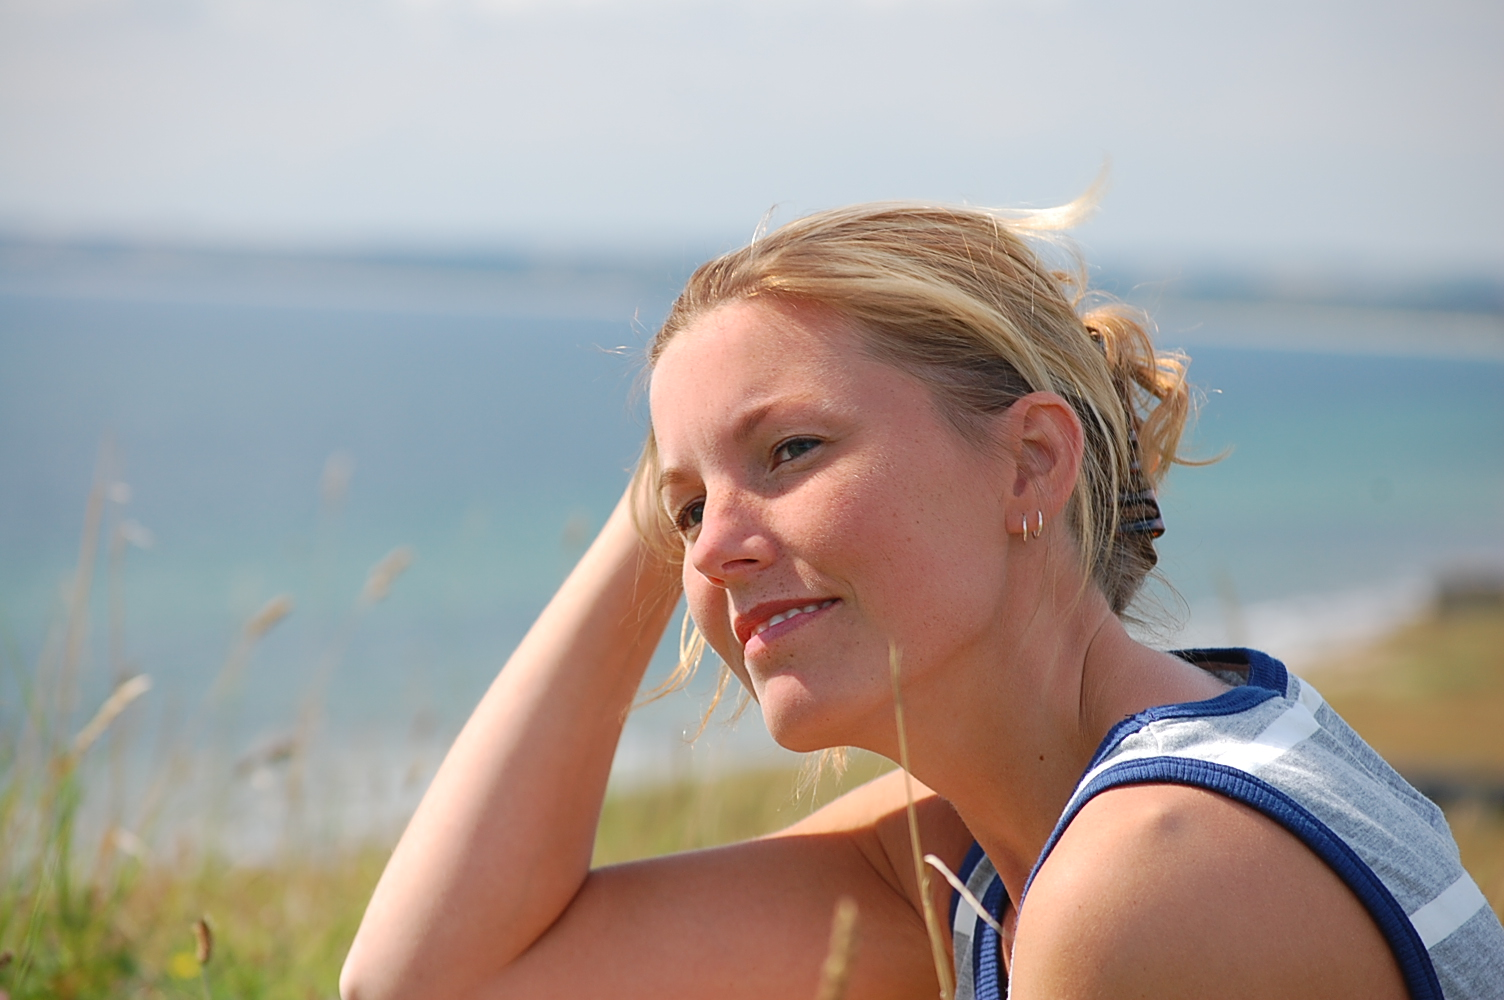 Madeleine on the beach